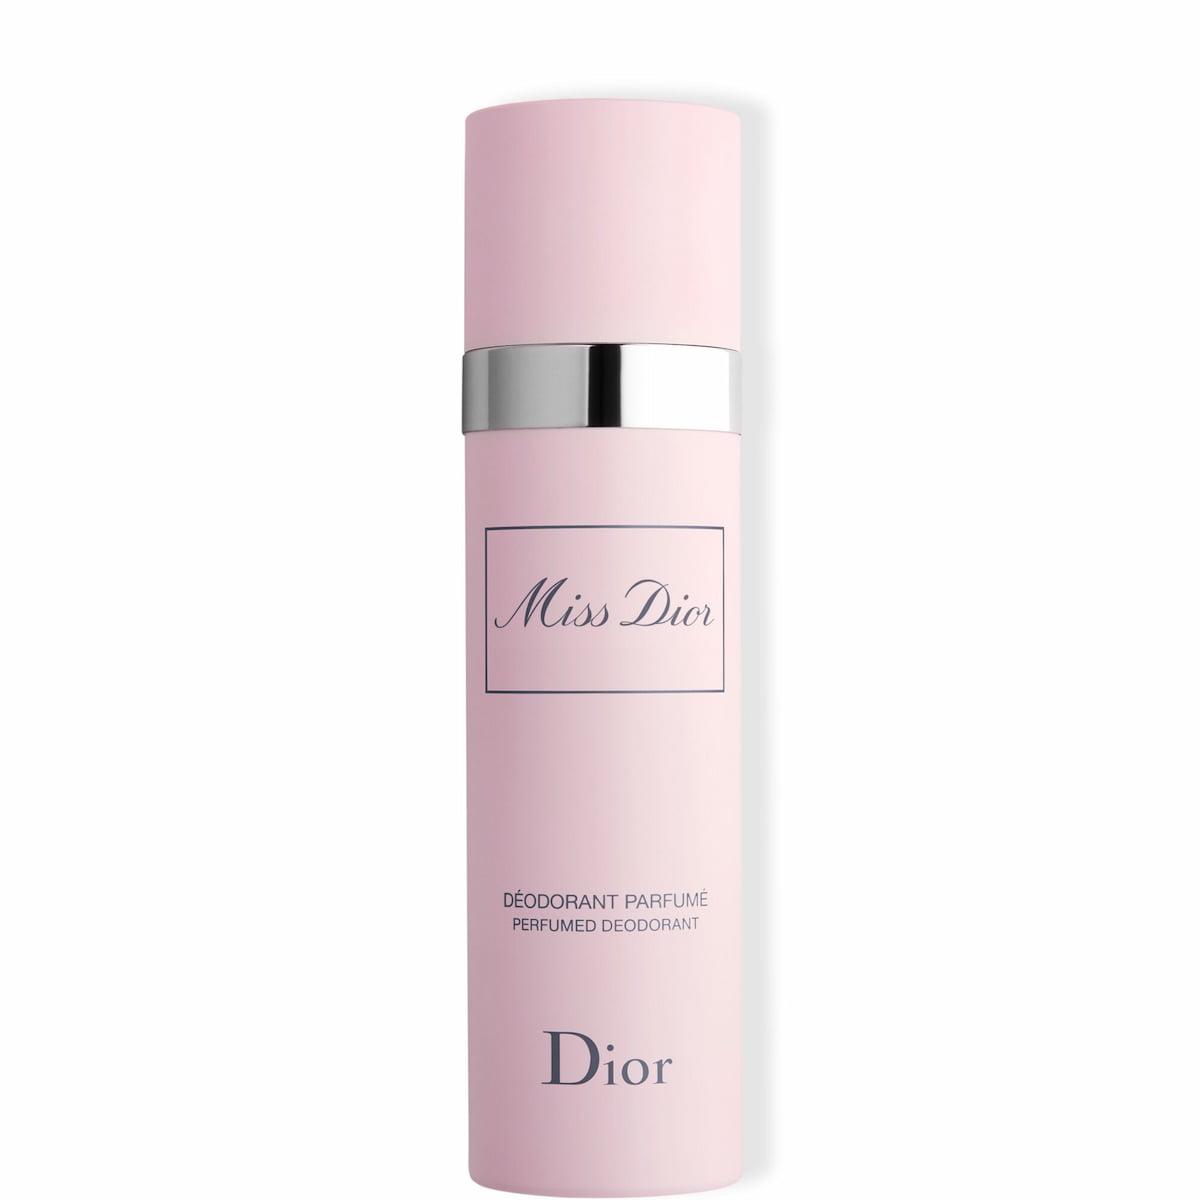 Déodorant spray Miss Dior - DIOR